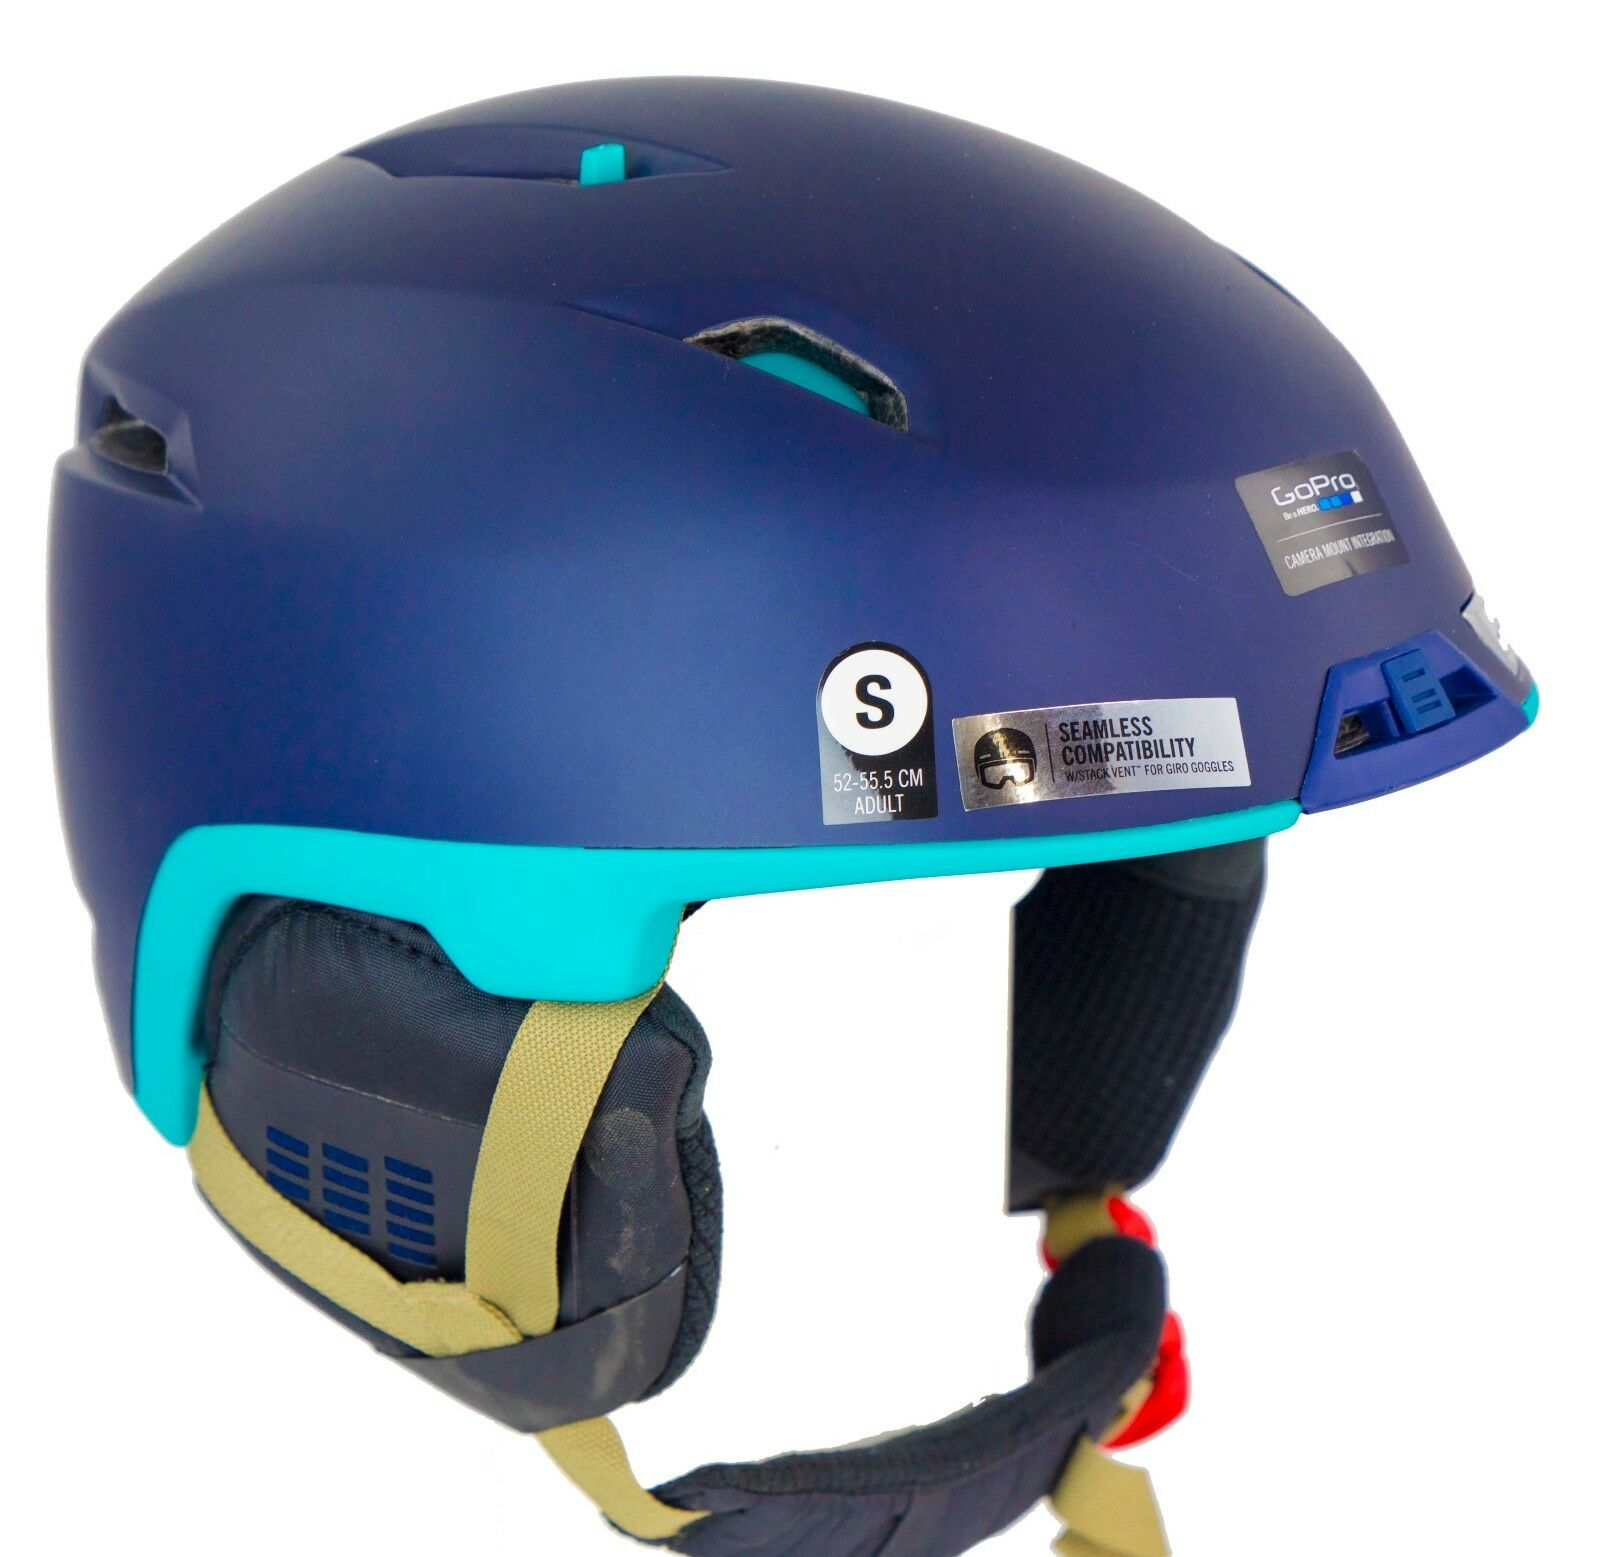 NEW  180  Mens Giro Edit Navy bluee Go-Pro Snowboarding Skiing Helmet Smith Small  lowest prices